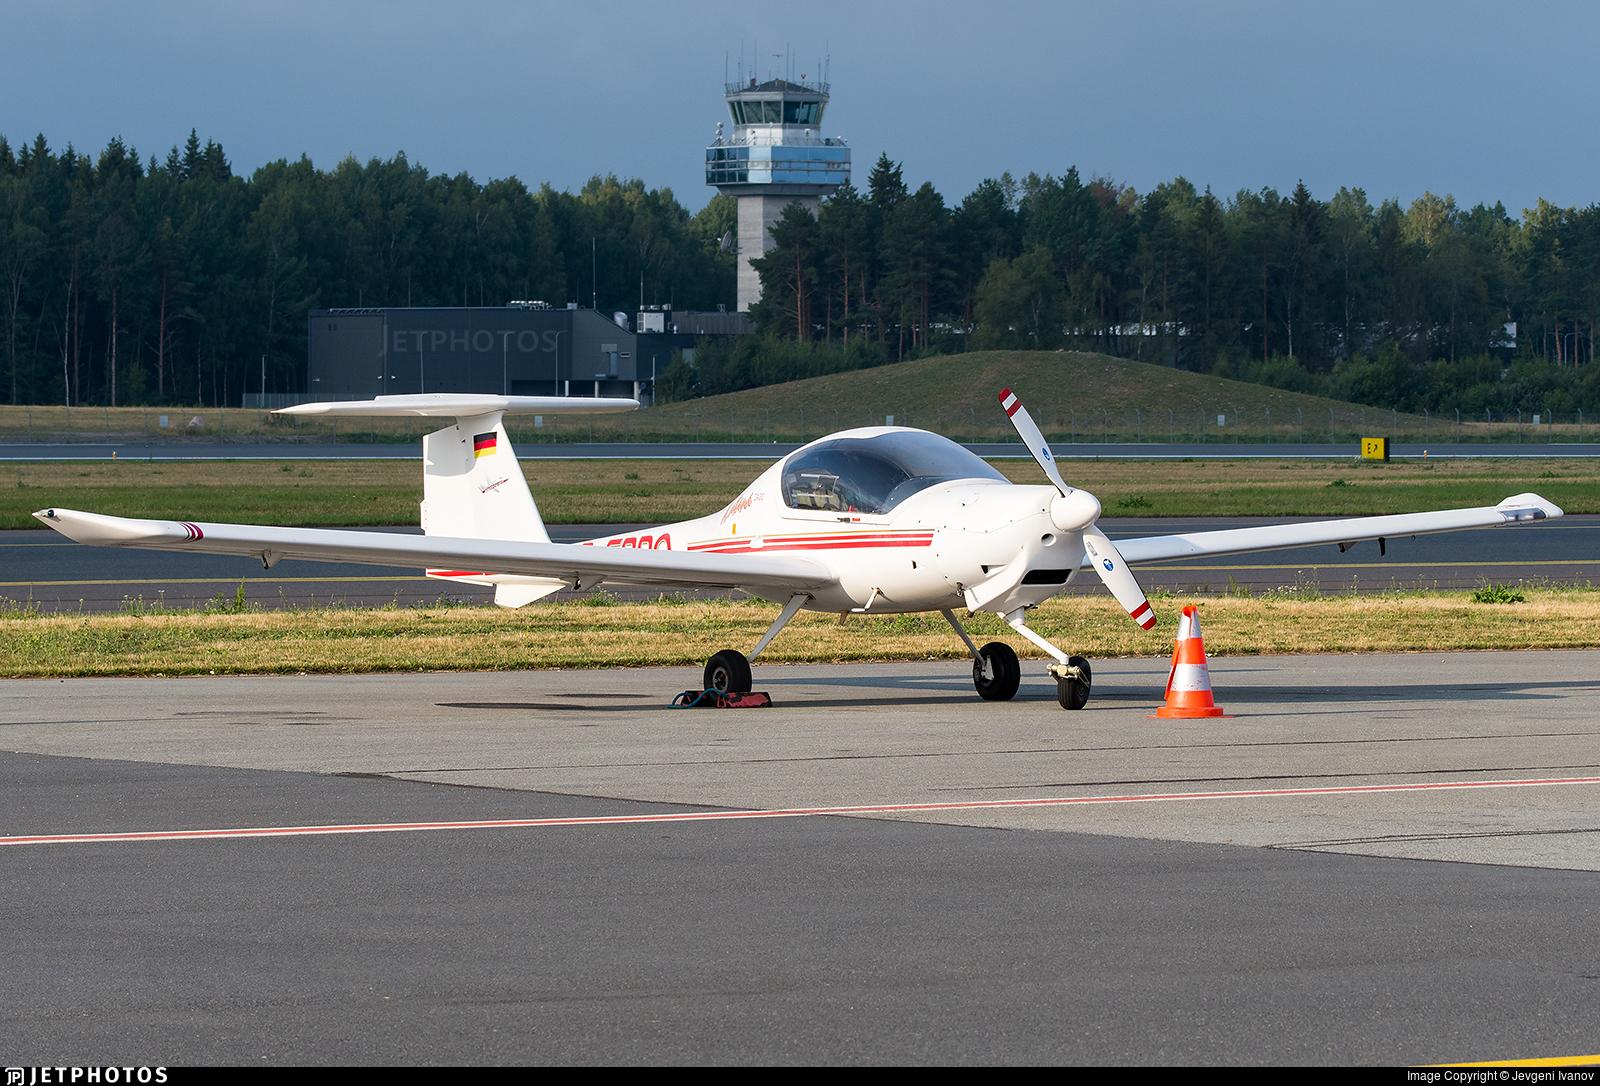 D-EPPO - Diamond DA-20-A1 Katana - Aerotours